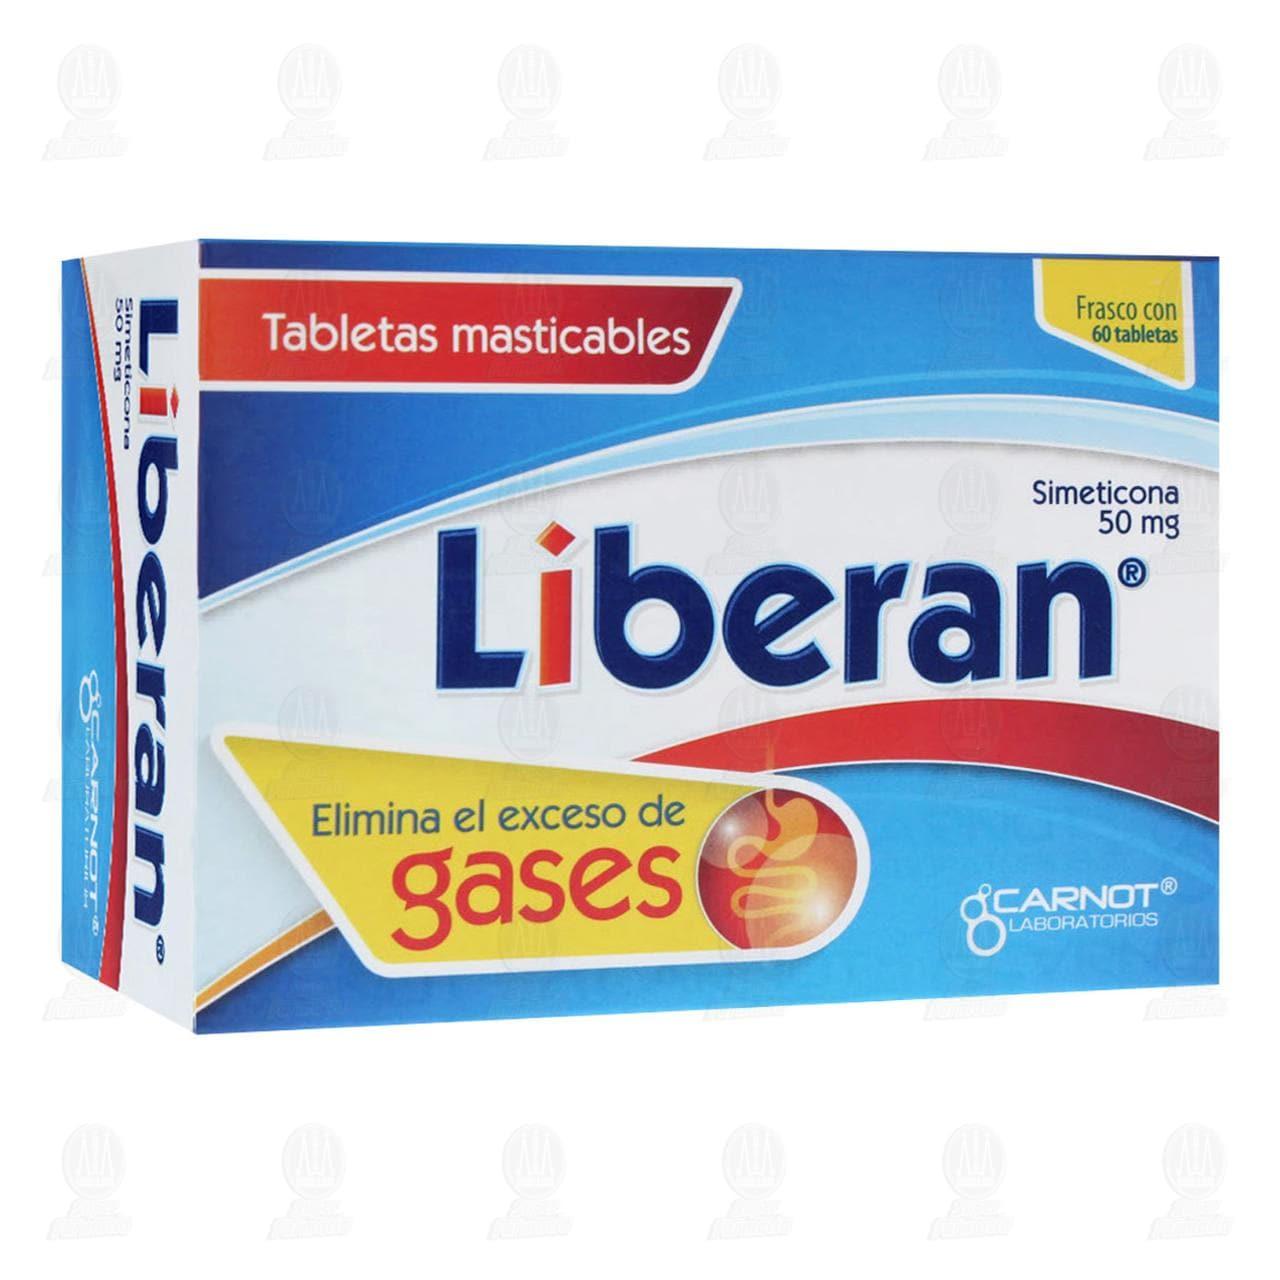 Comprar Liberan 50mg 60 Tabletas Masticables en Farmacias Guadalajara